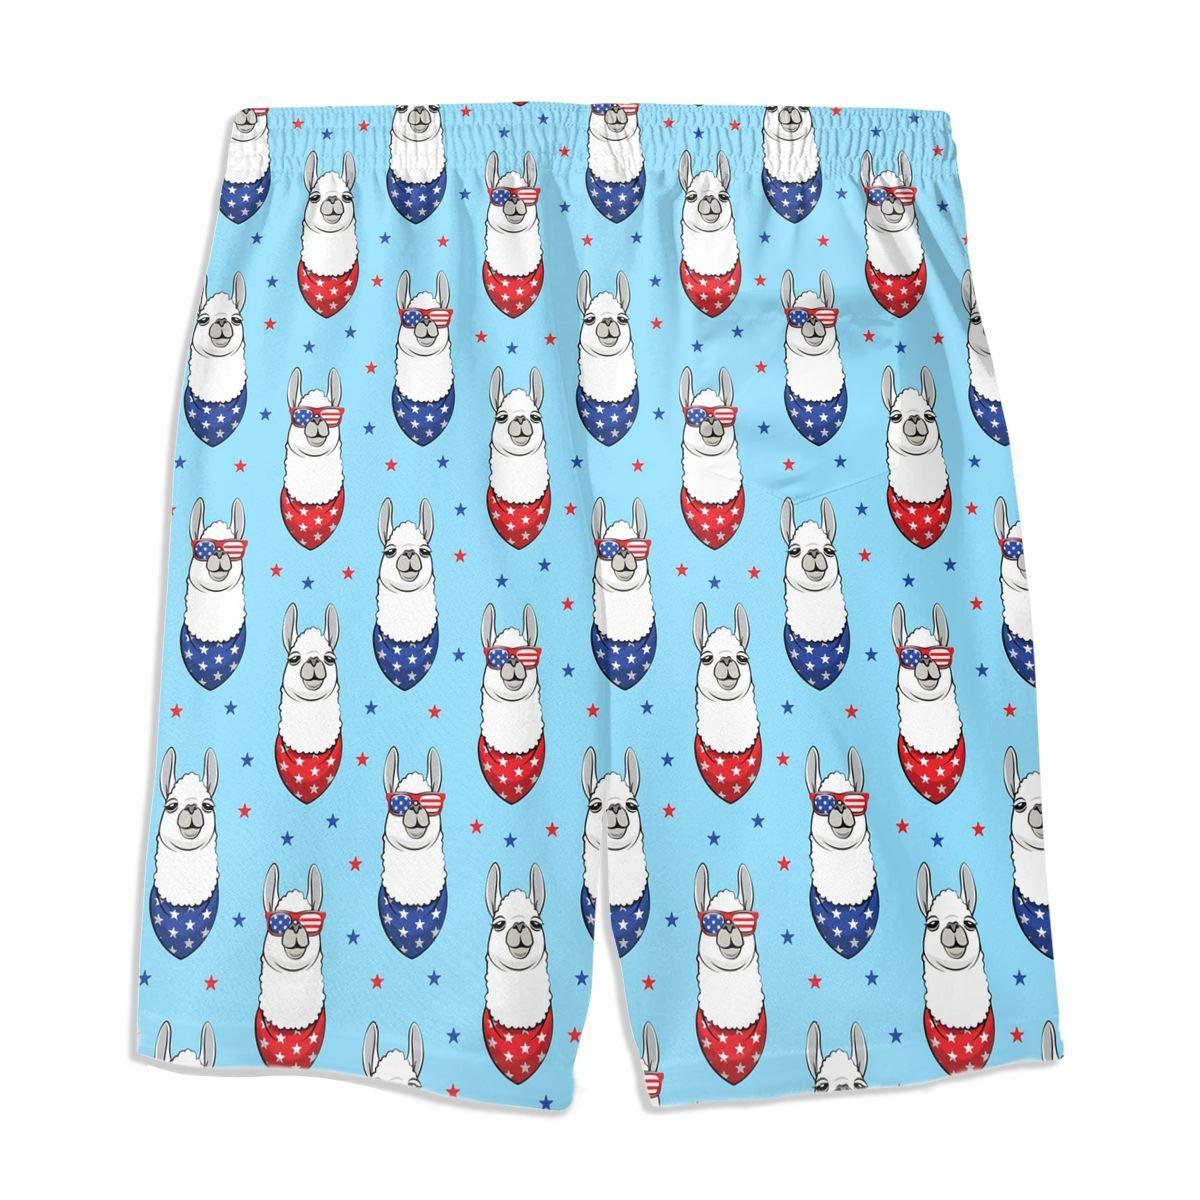 Independence Day Birthday Patriotic 4TH July Happy Llama American Teen Swim Trunks Bathing Suit Shorts Board Beach